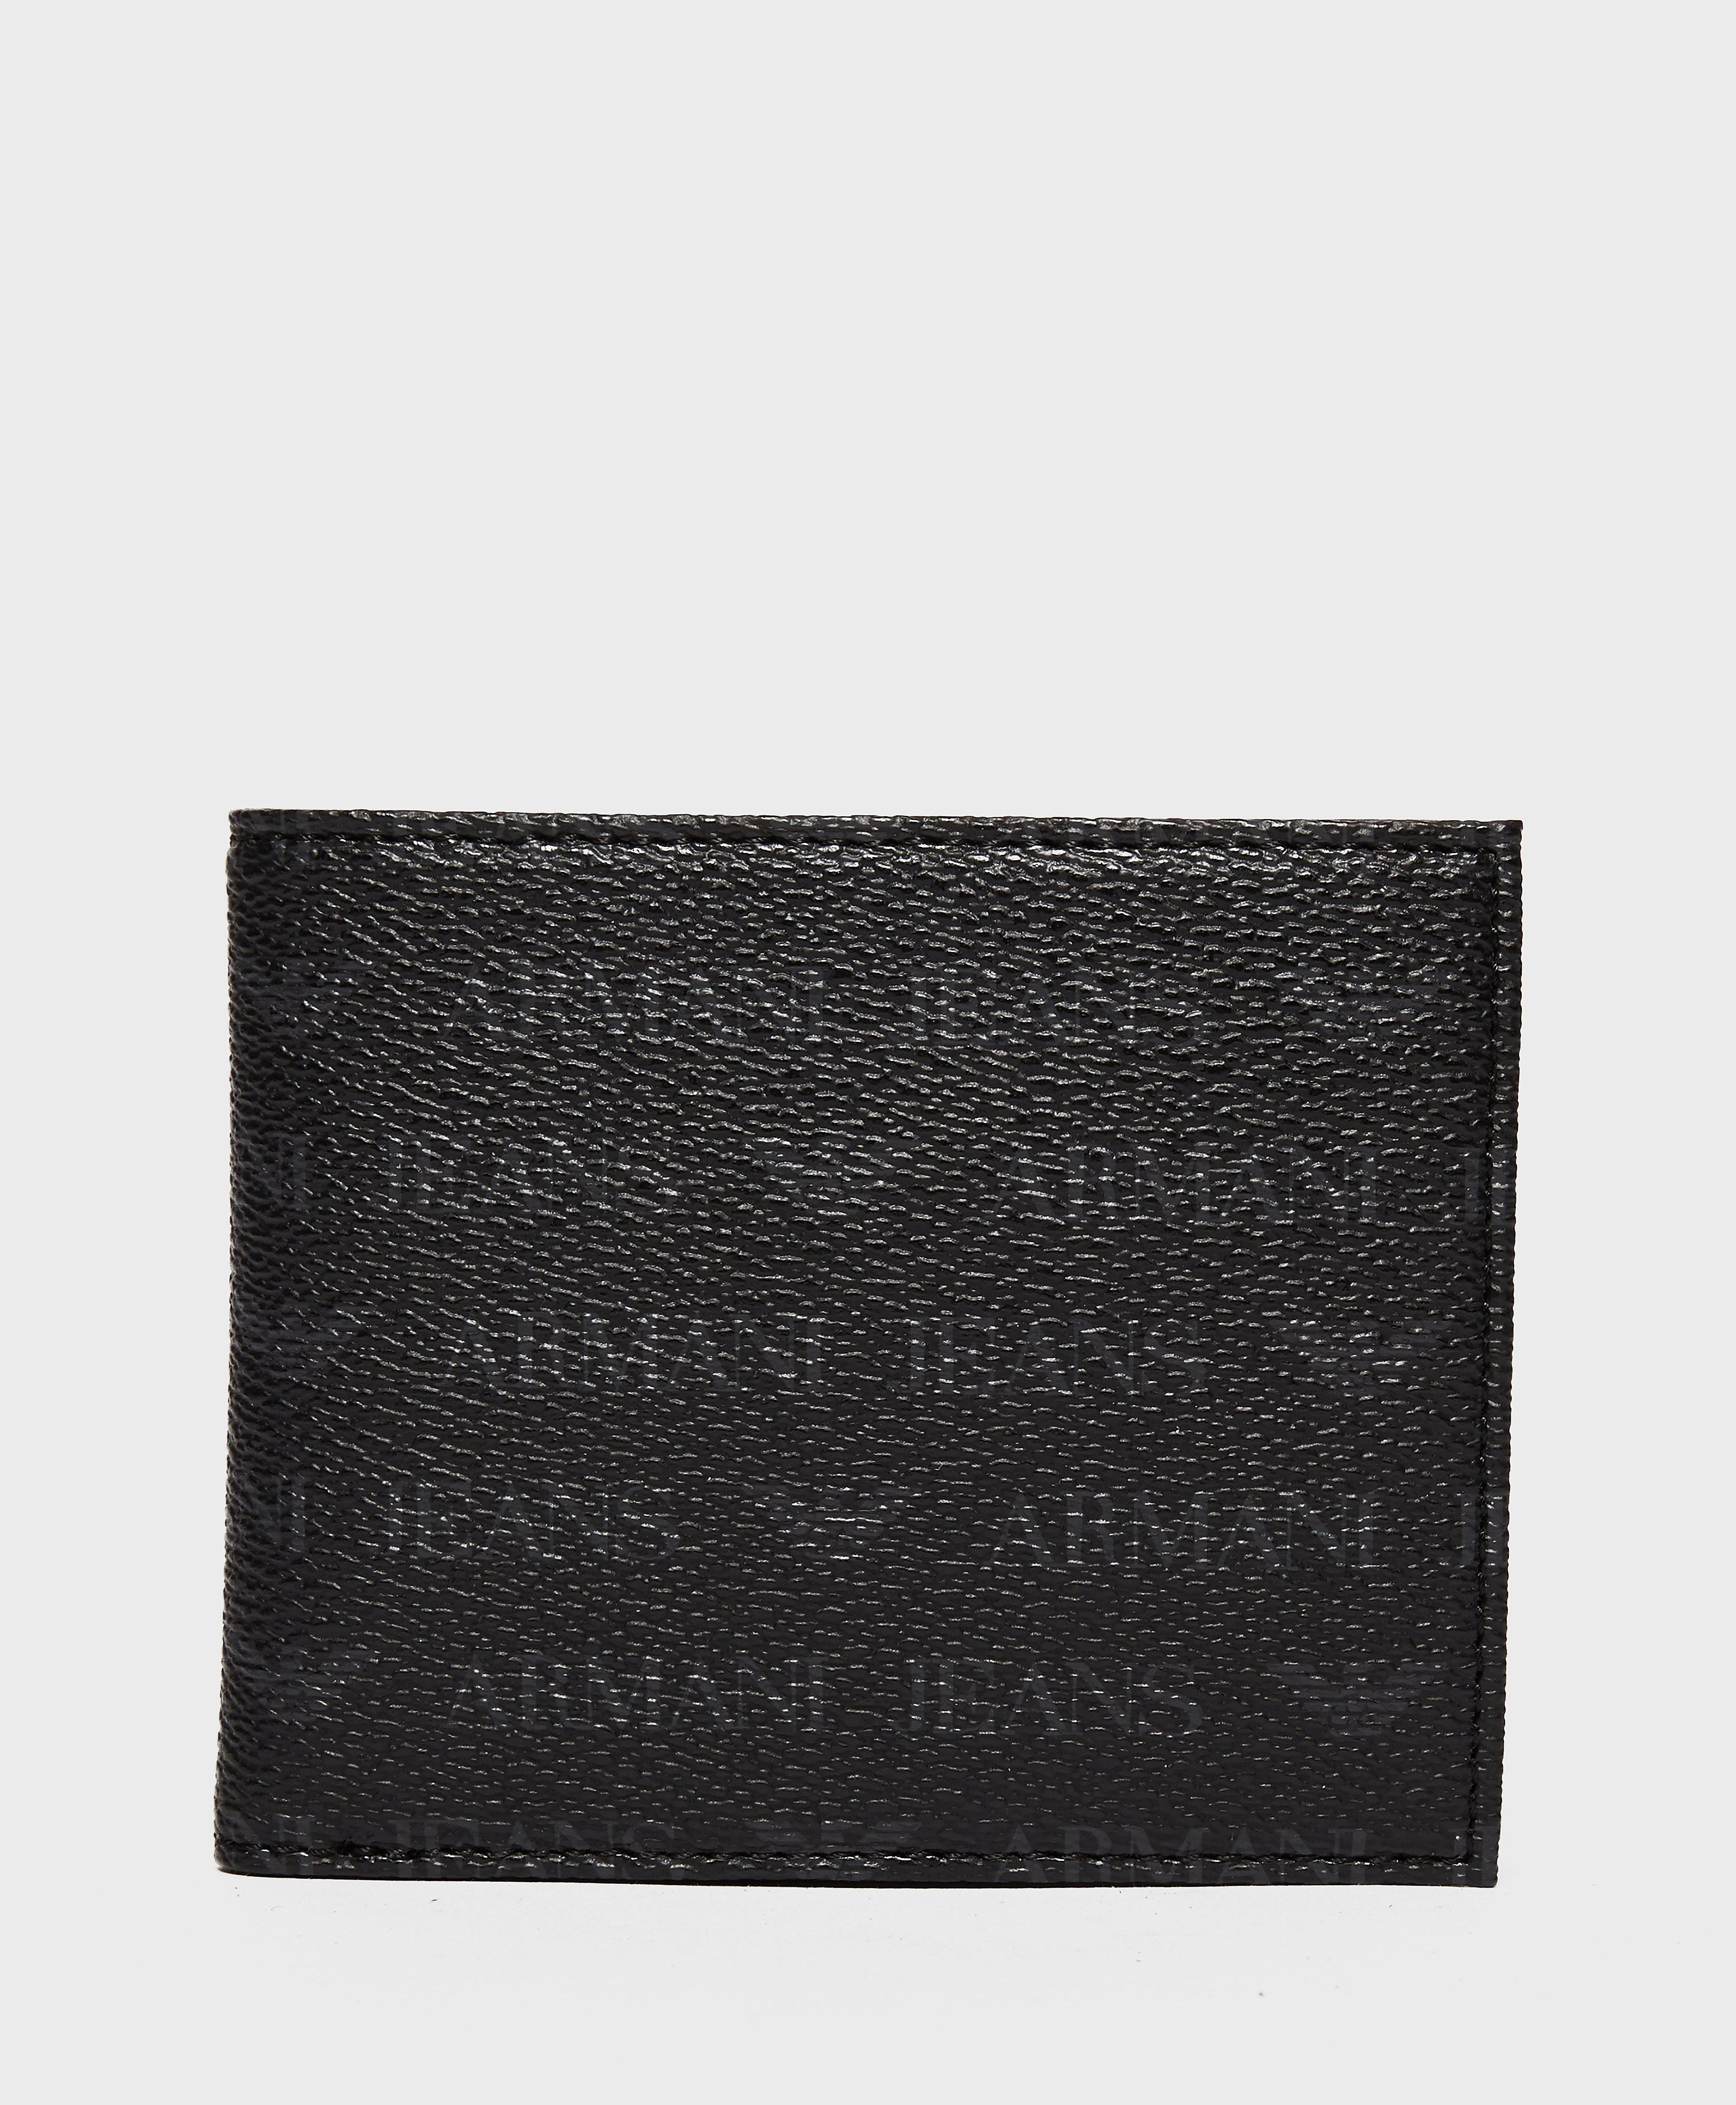 Armani Jeans Billfold Wallet  Black Black